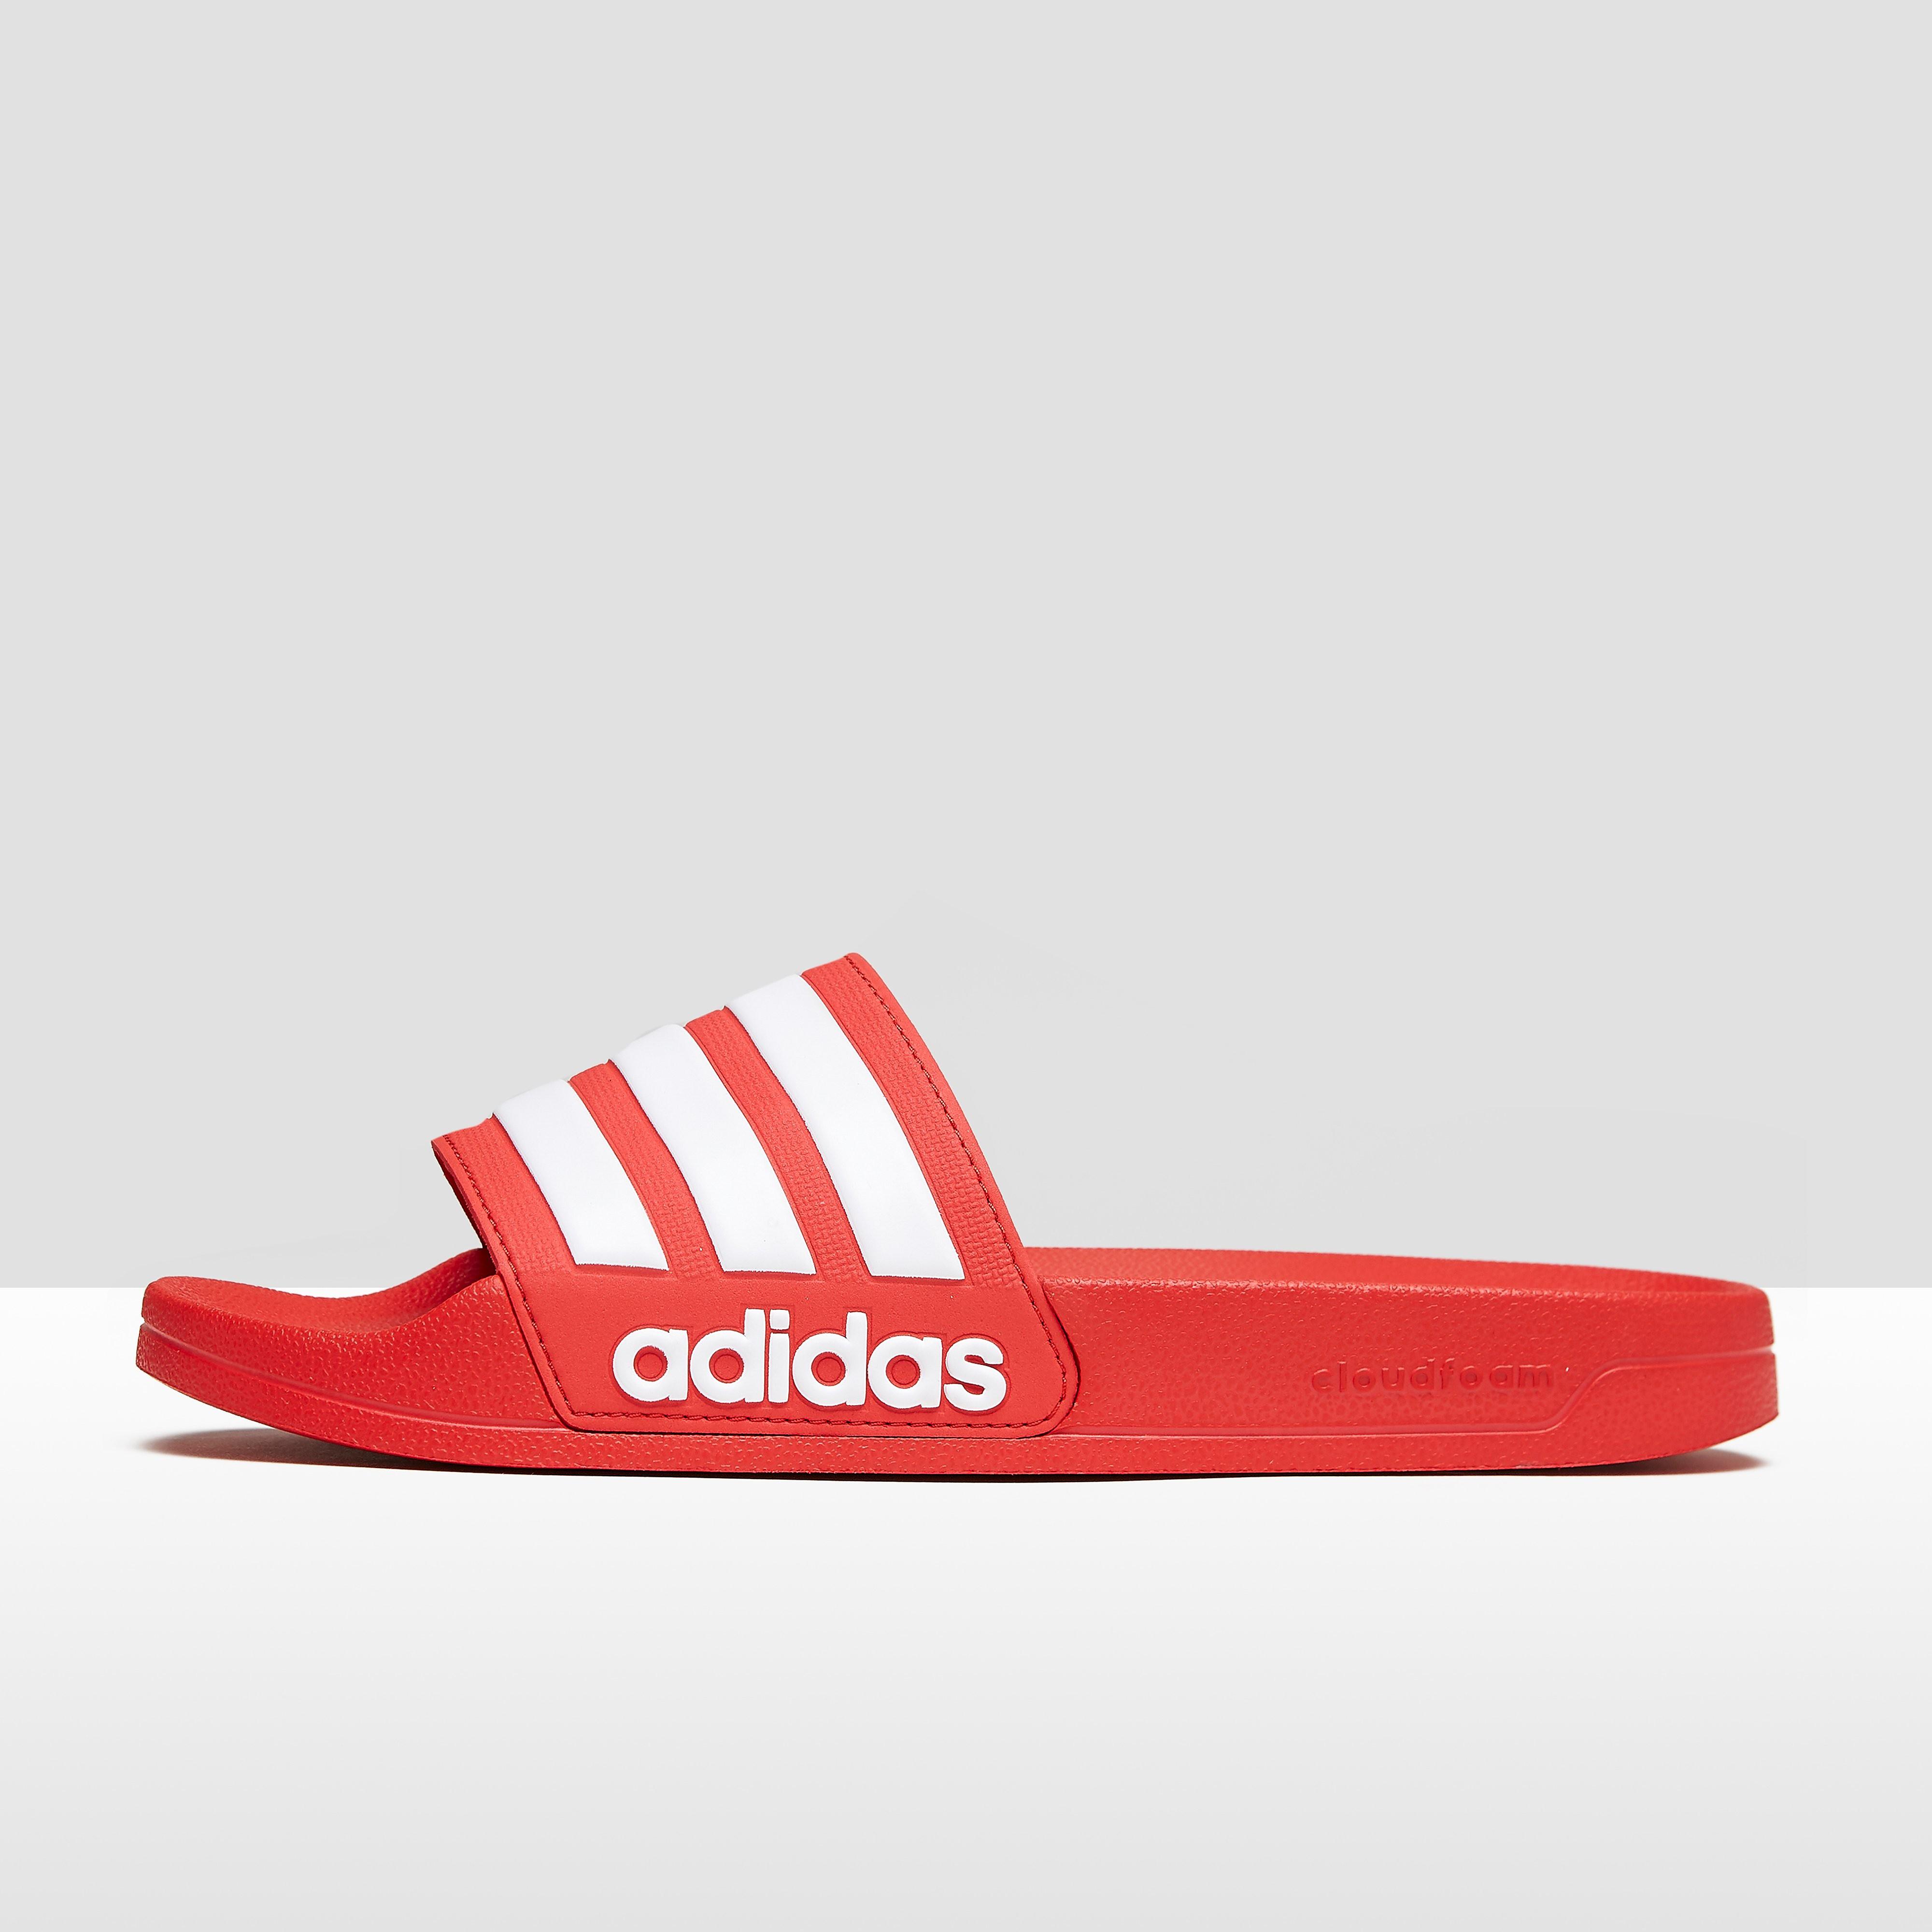 Adidas Adilette herensneaker rood